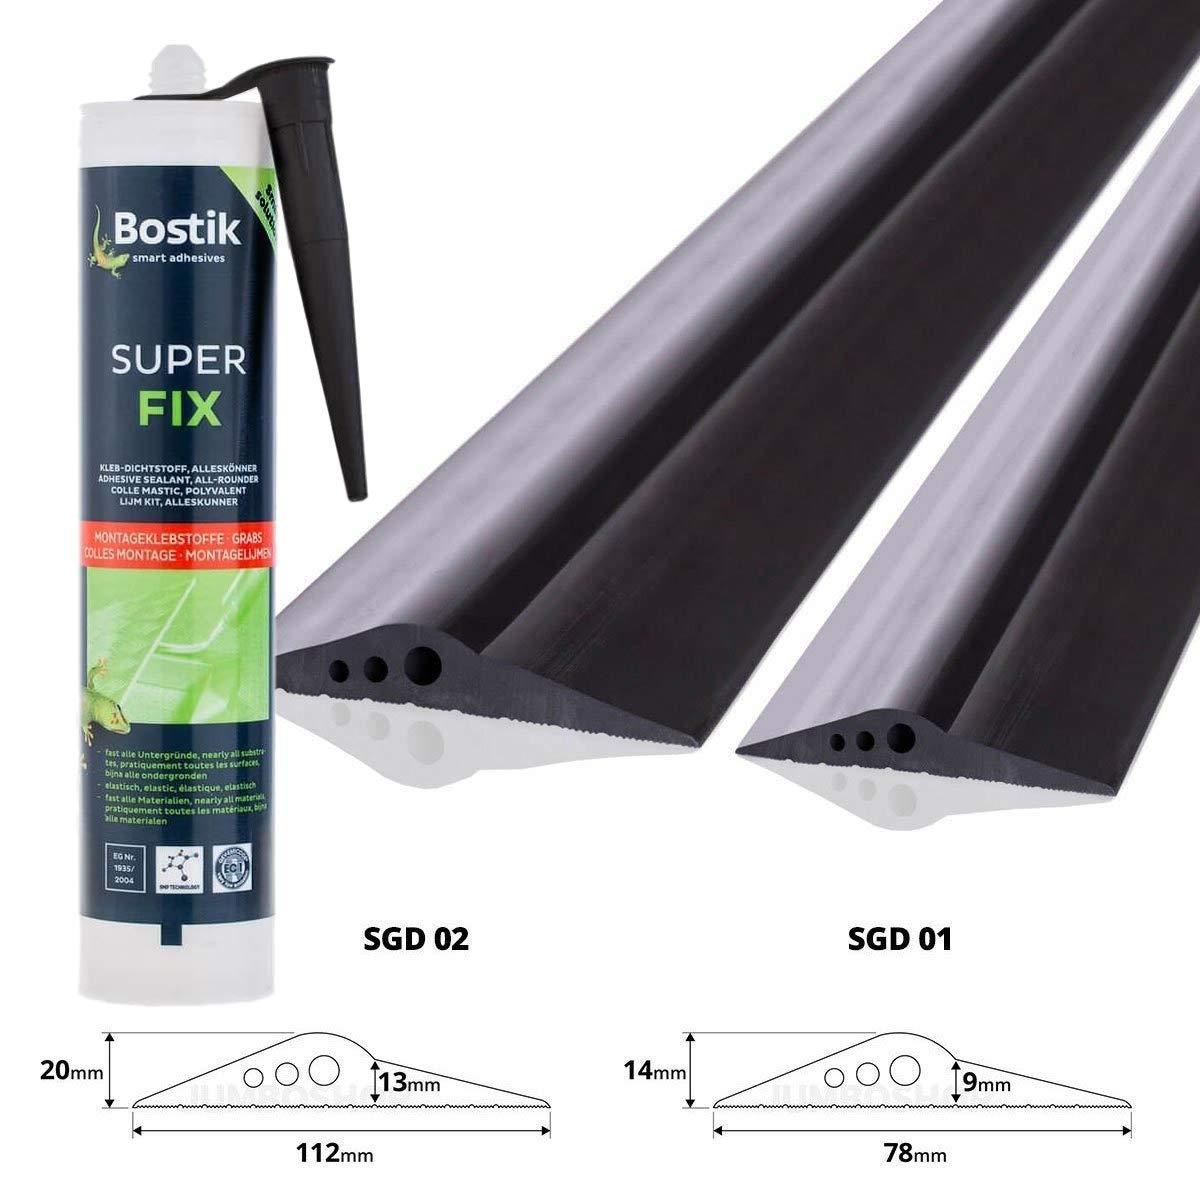 STEIGNER Garage Door Floor Seal Threshold + Adhesive Kit 1, 5 m 20 mm x 112 mm SGD02 EPDM Weather Strip Drought And Water Excluder Ramp